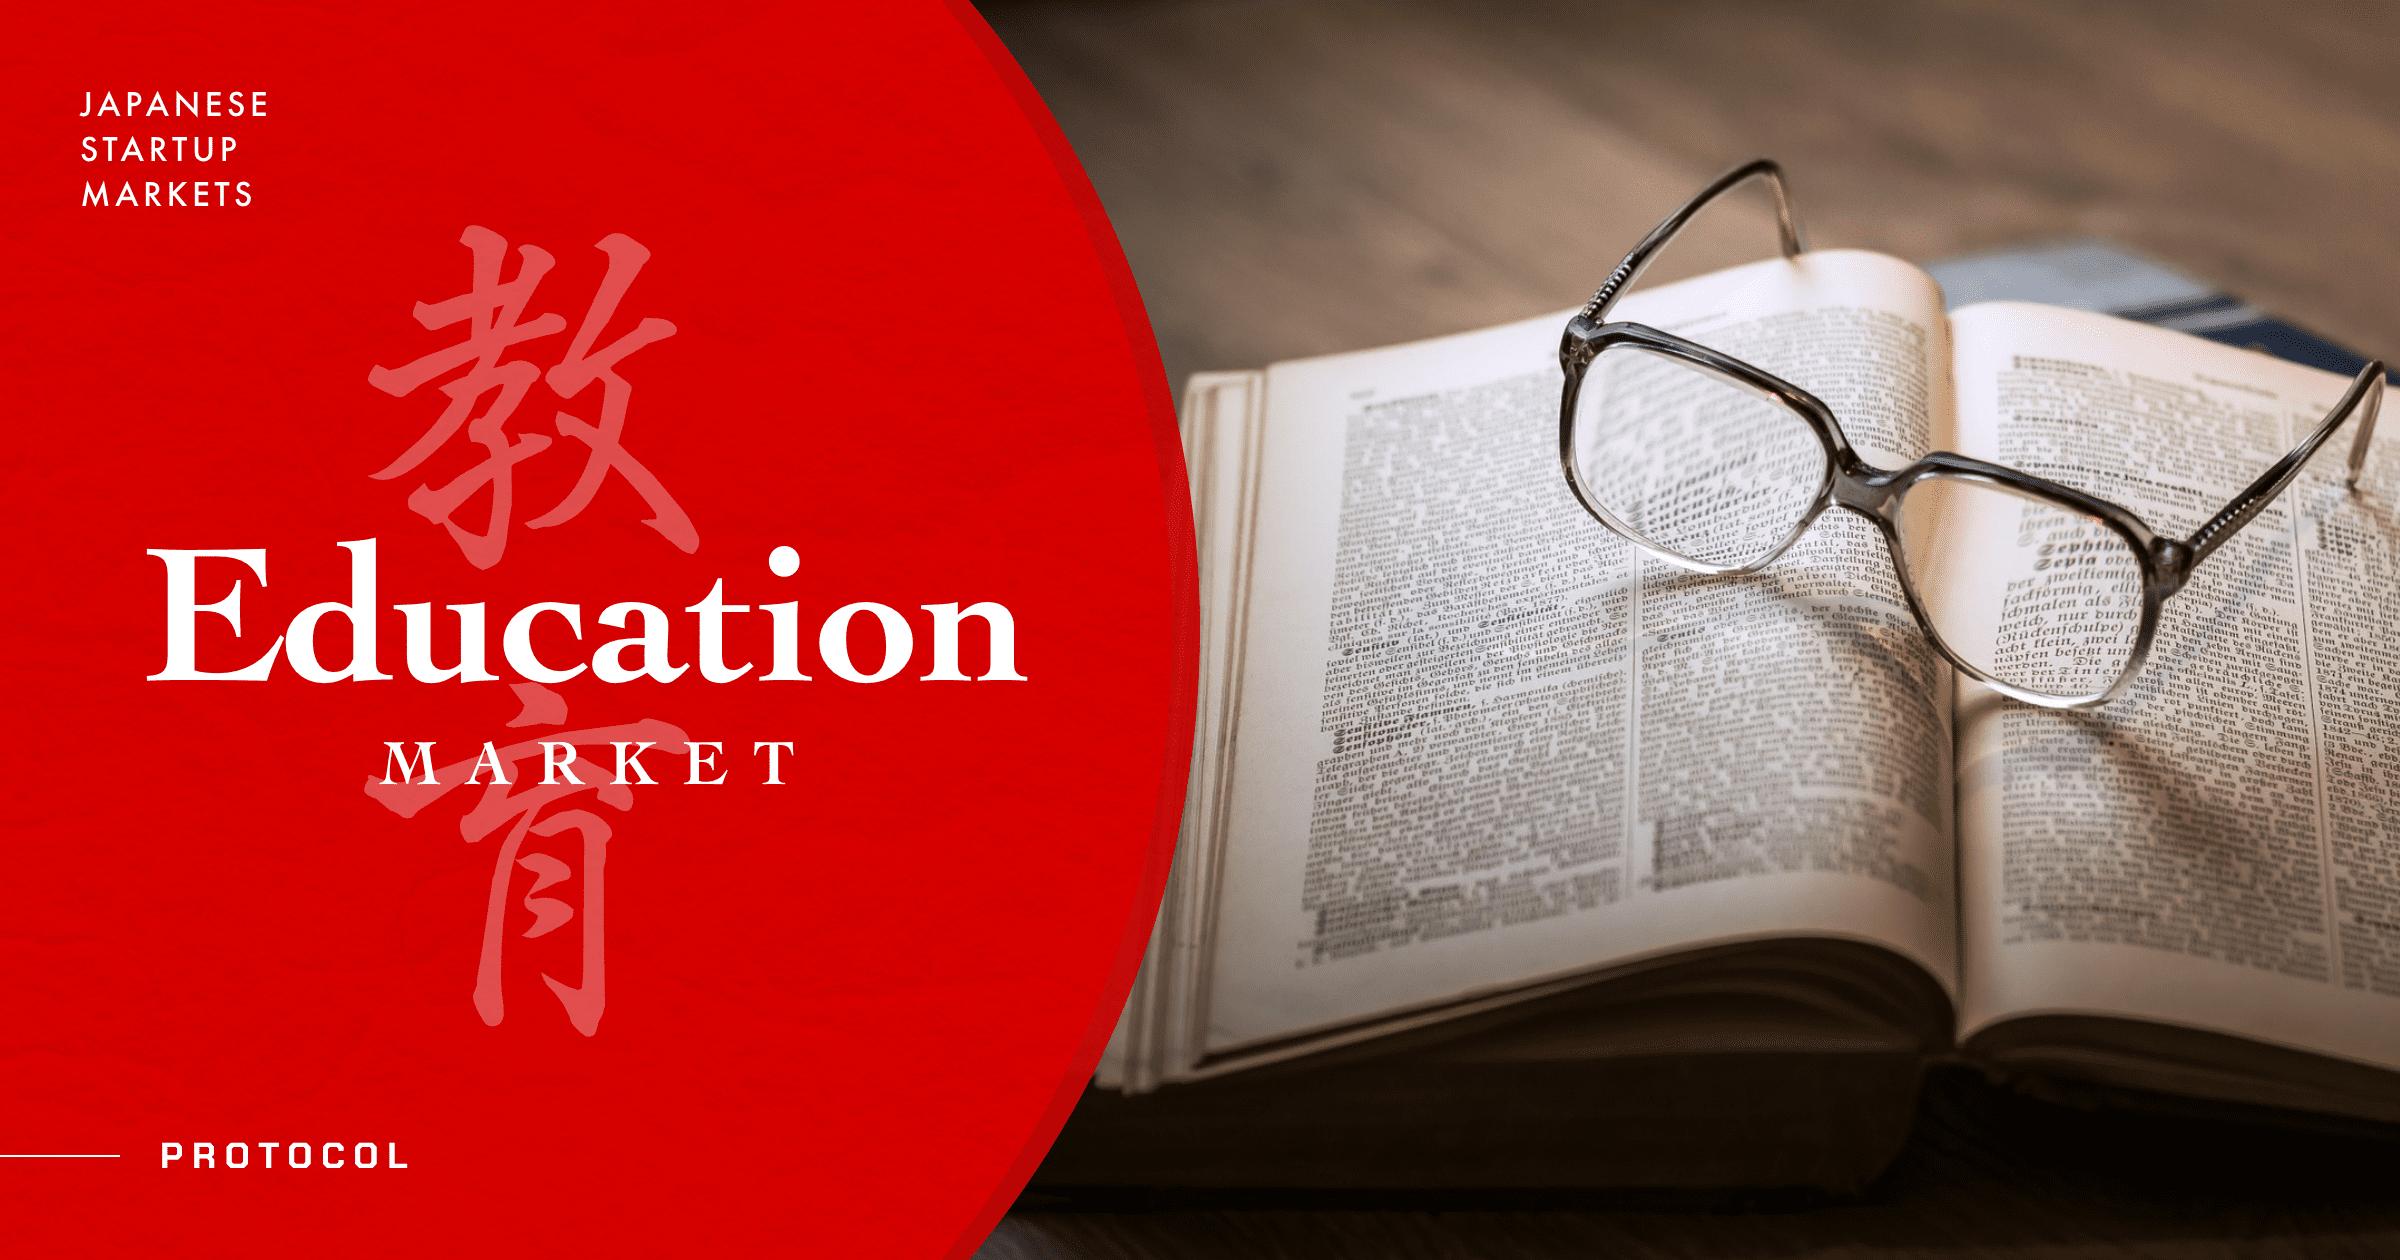 Japanese Startup Markets: Education